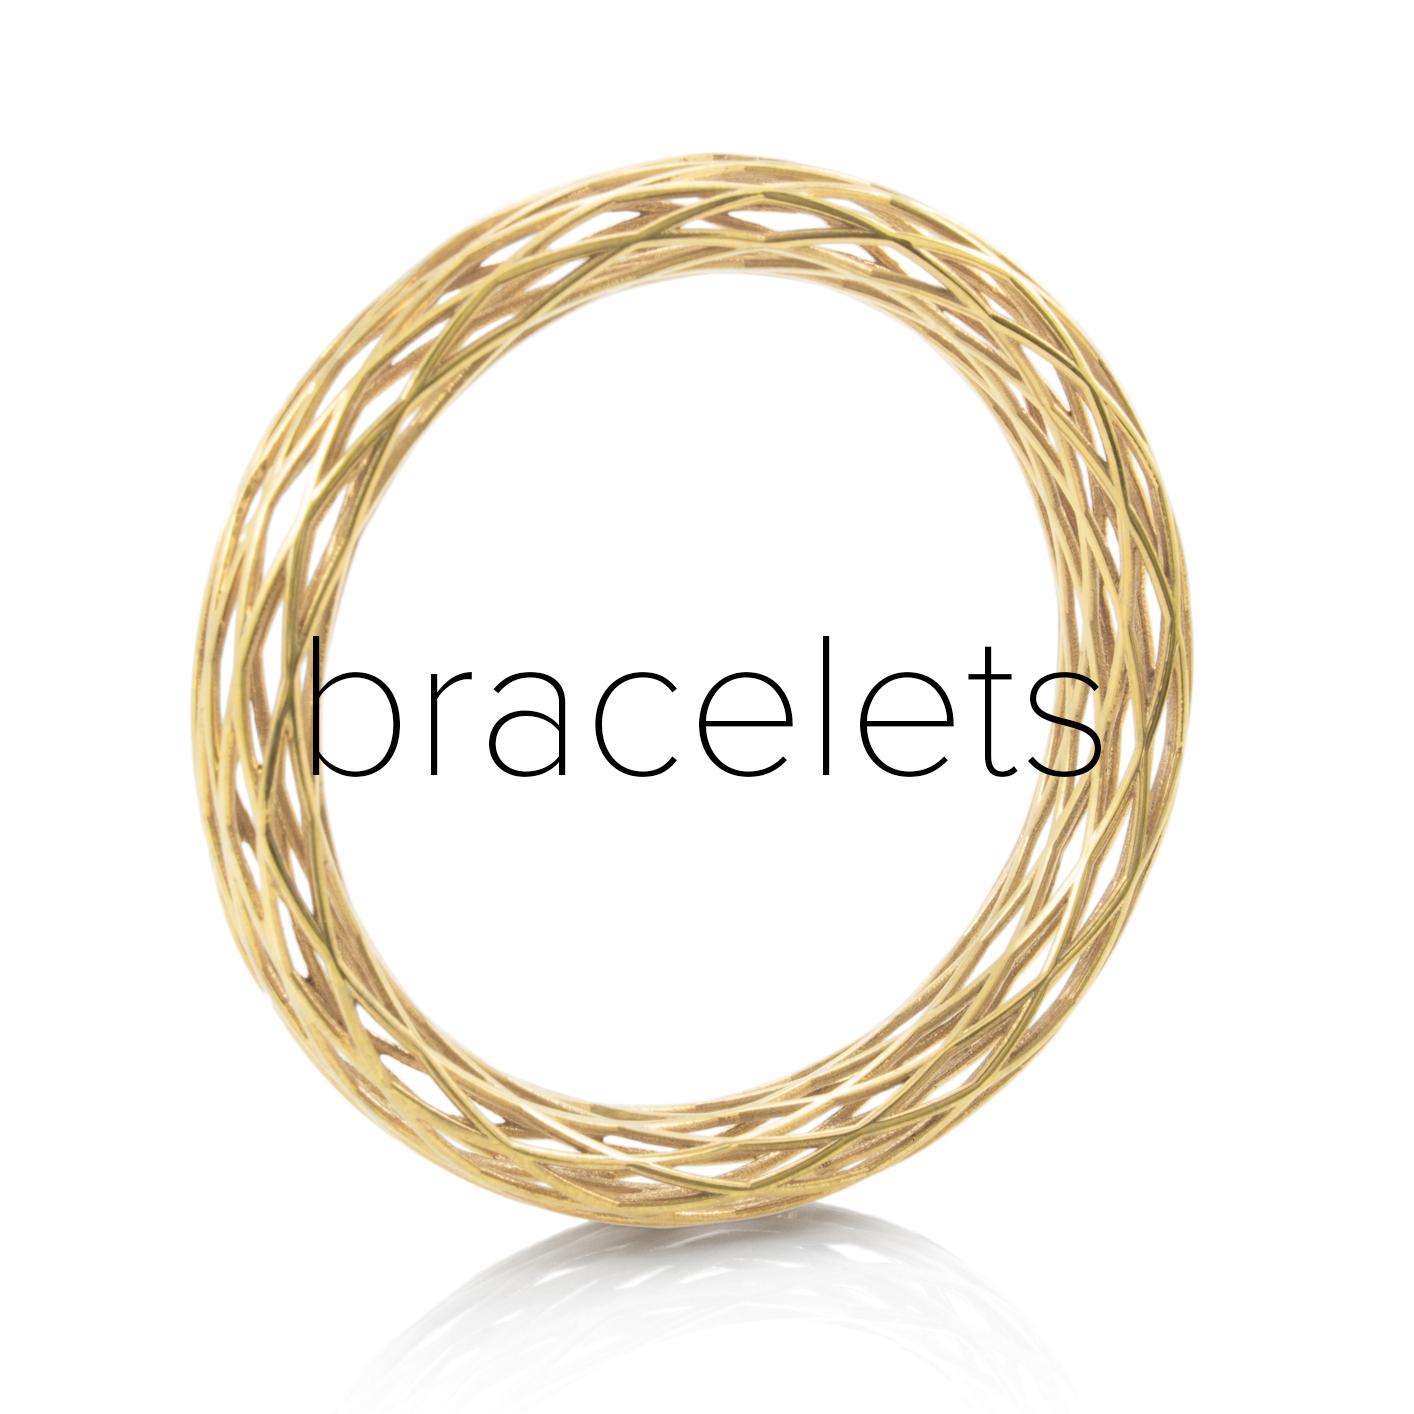 home-bracelets-2.jpg